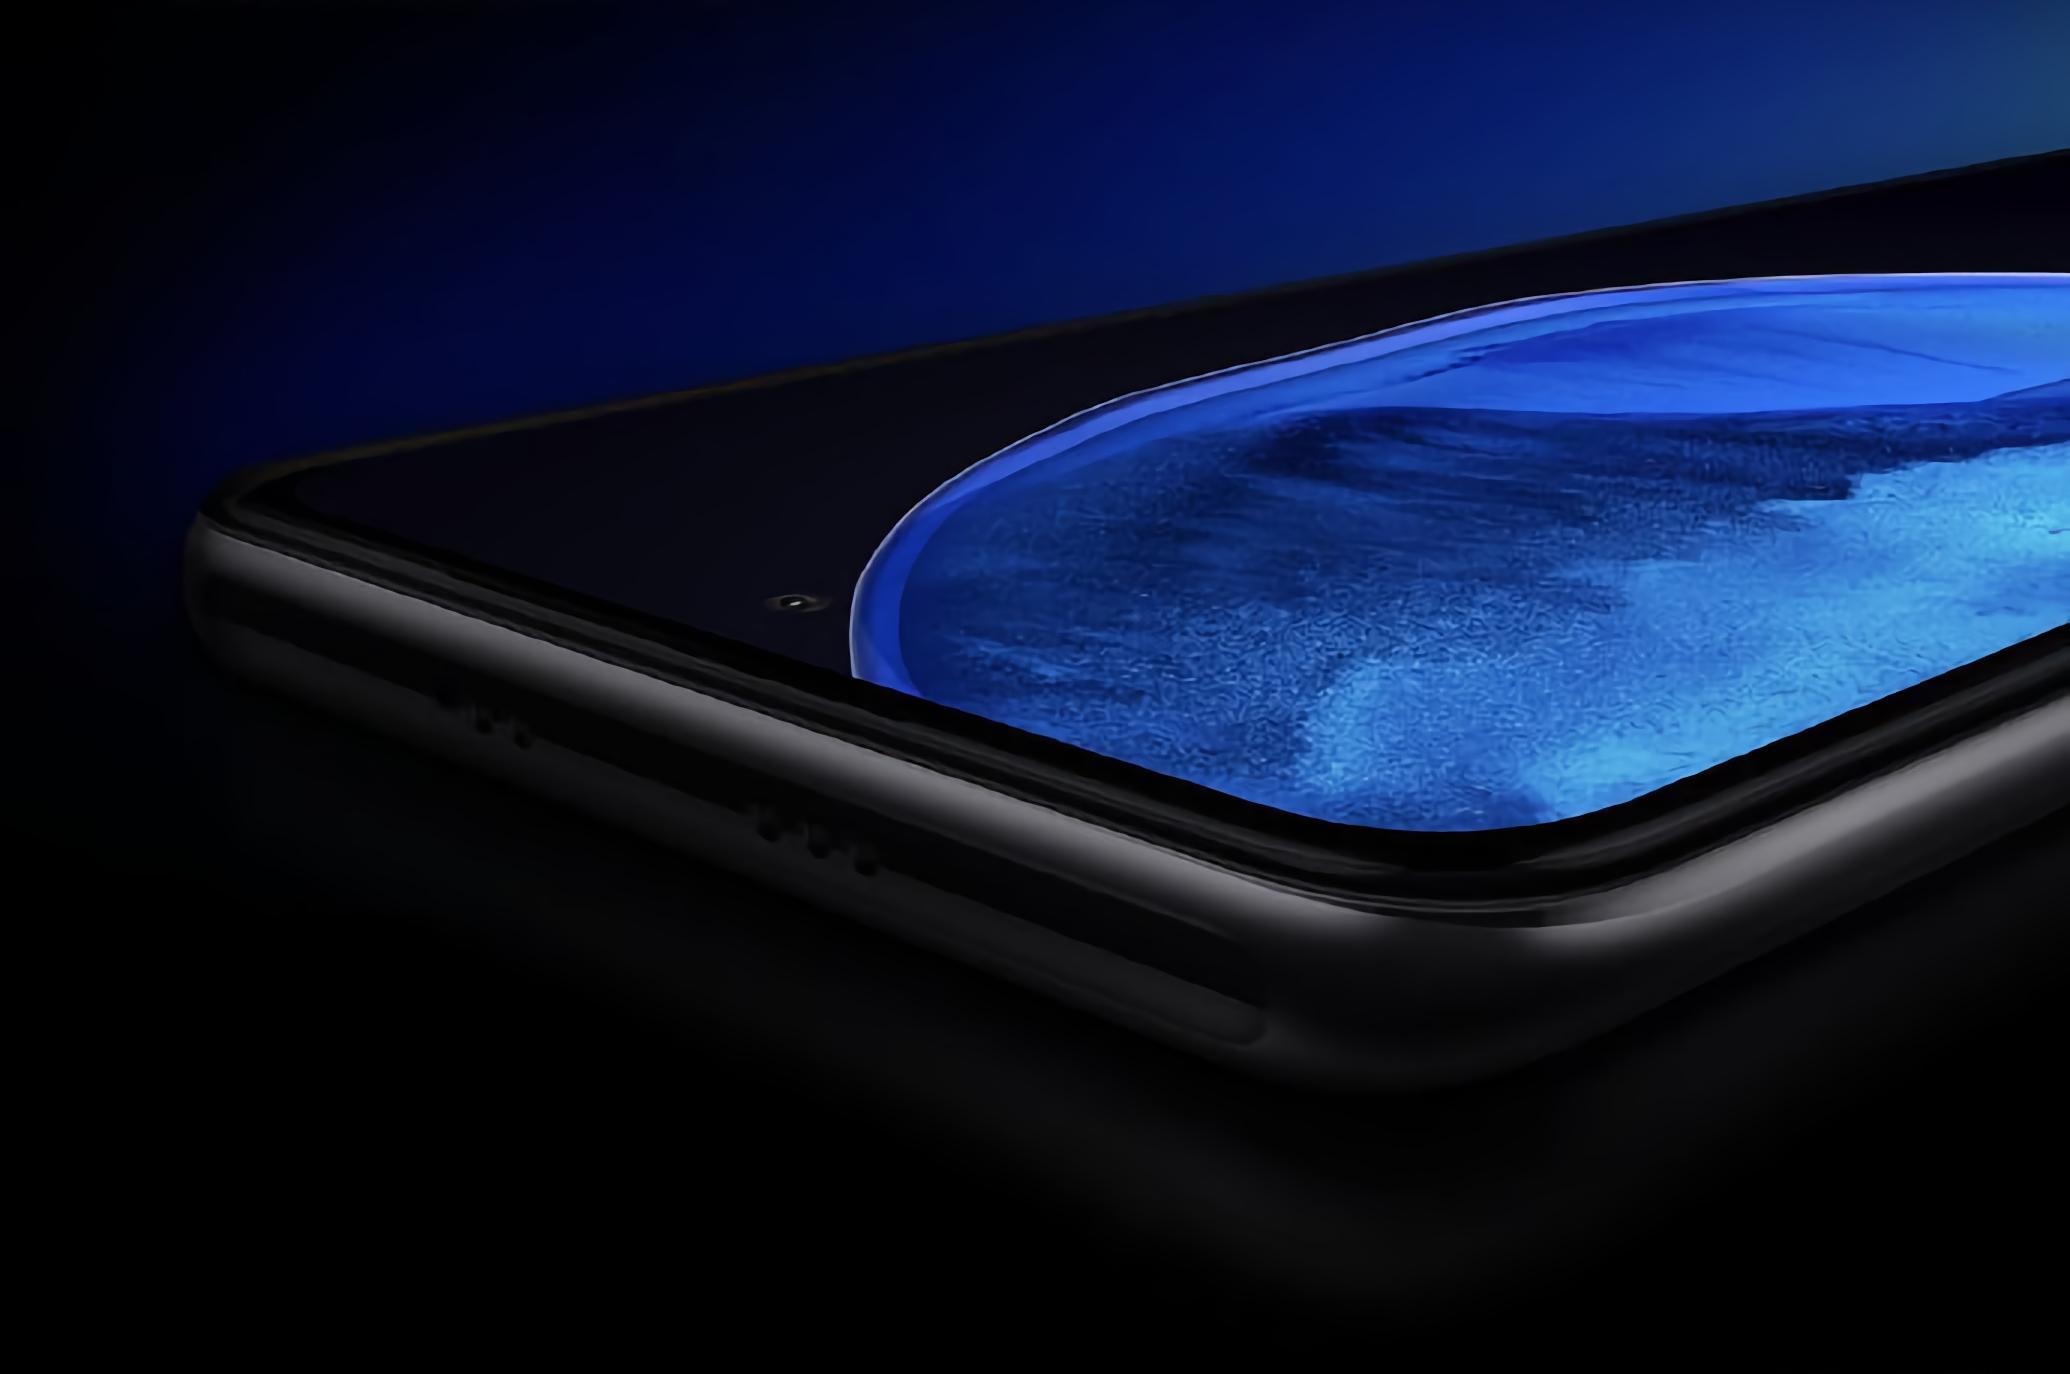 Xiaomi раскрыла характеристики дисплеев Redmi K40 и Redmi K40 Pro: плоские OLED-панели на 120 Гц с разрешением FHD